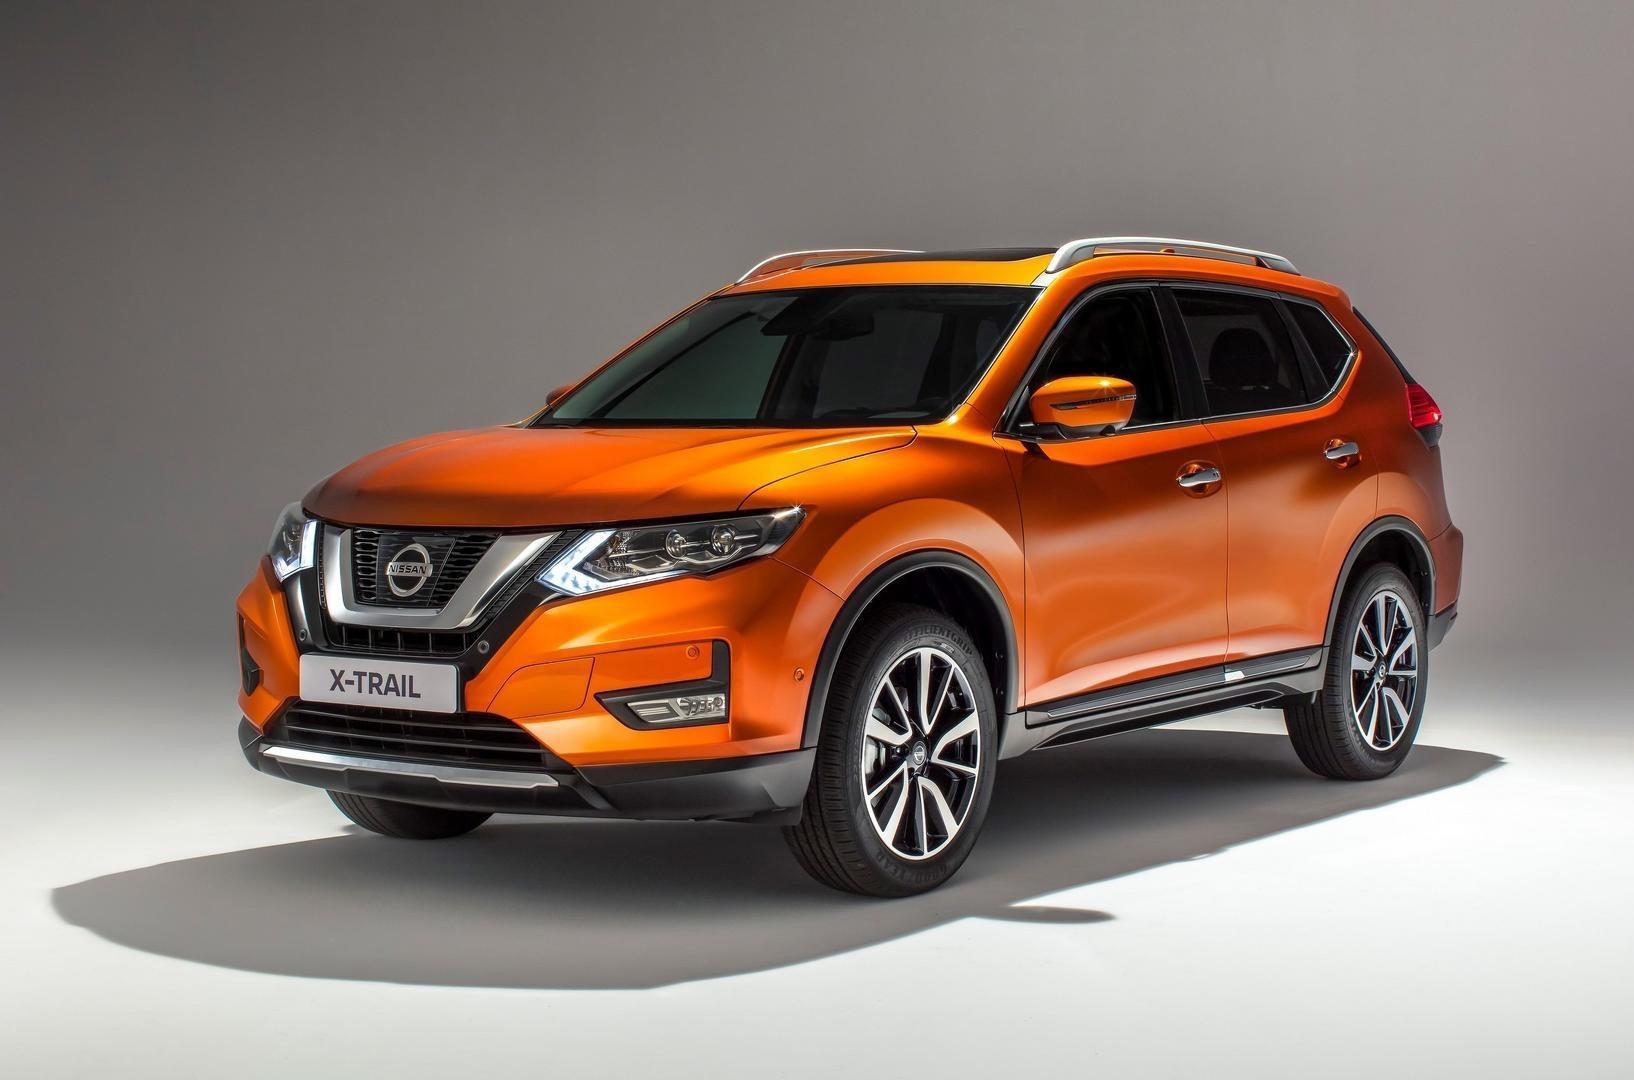 Европейскому Nissan X-Trail упростили гамму двигателей